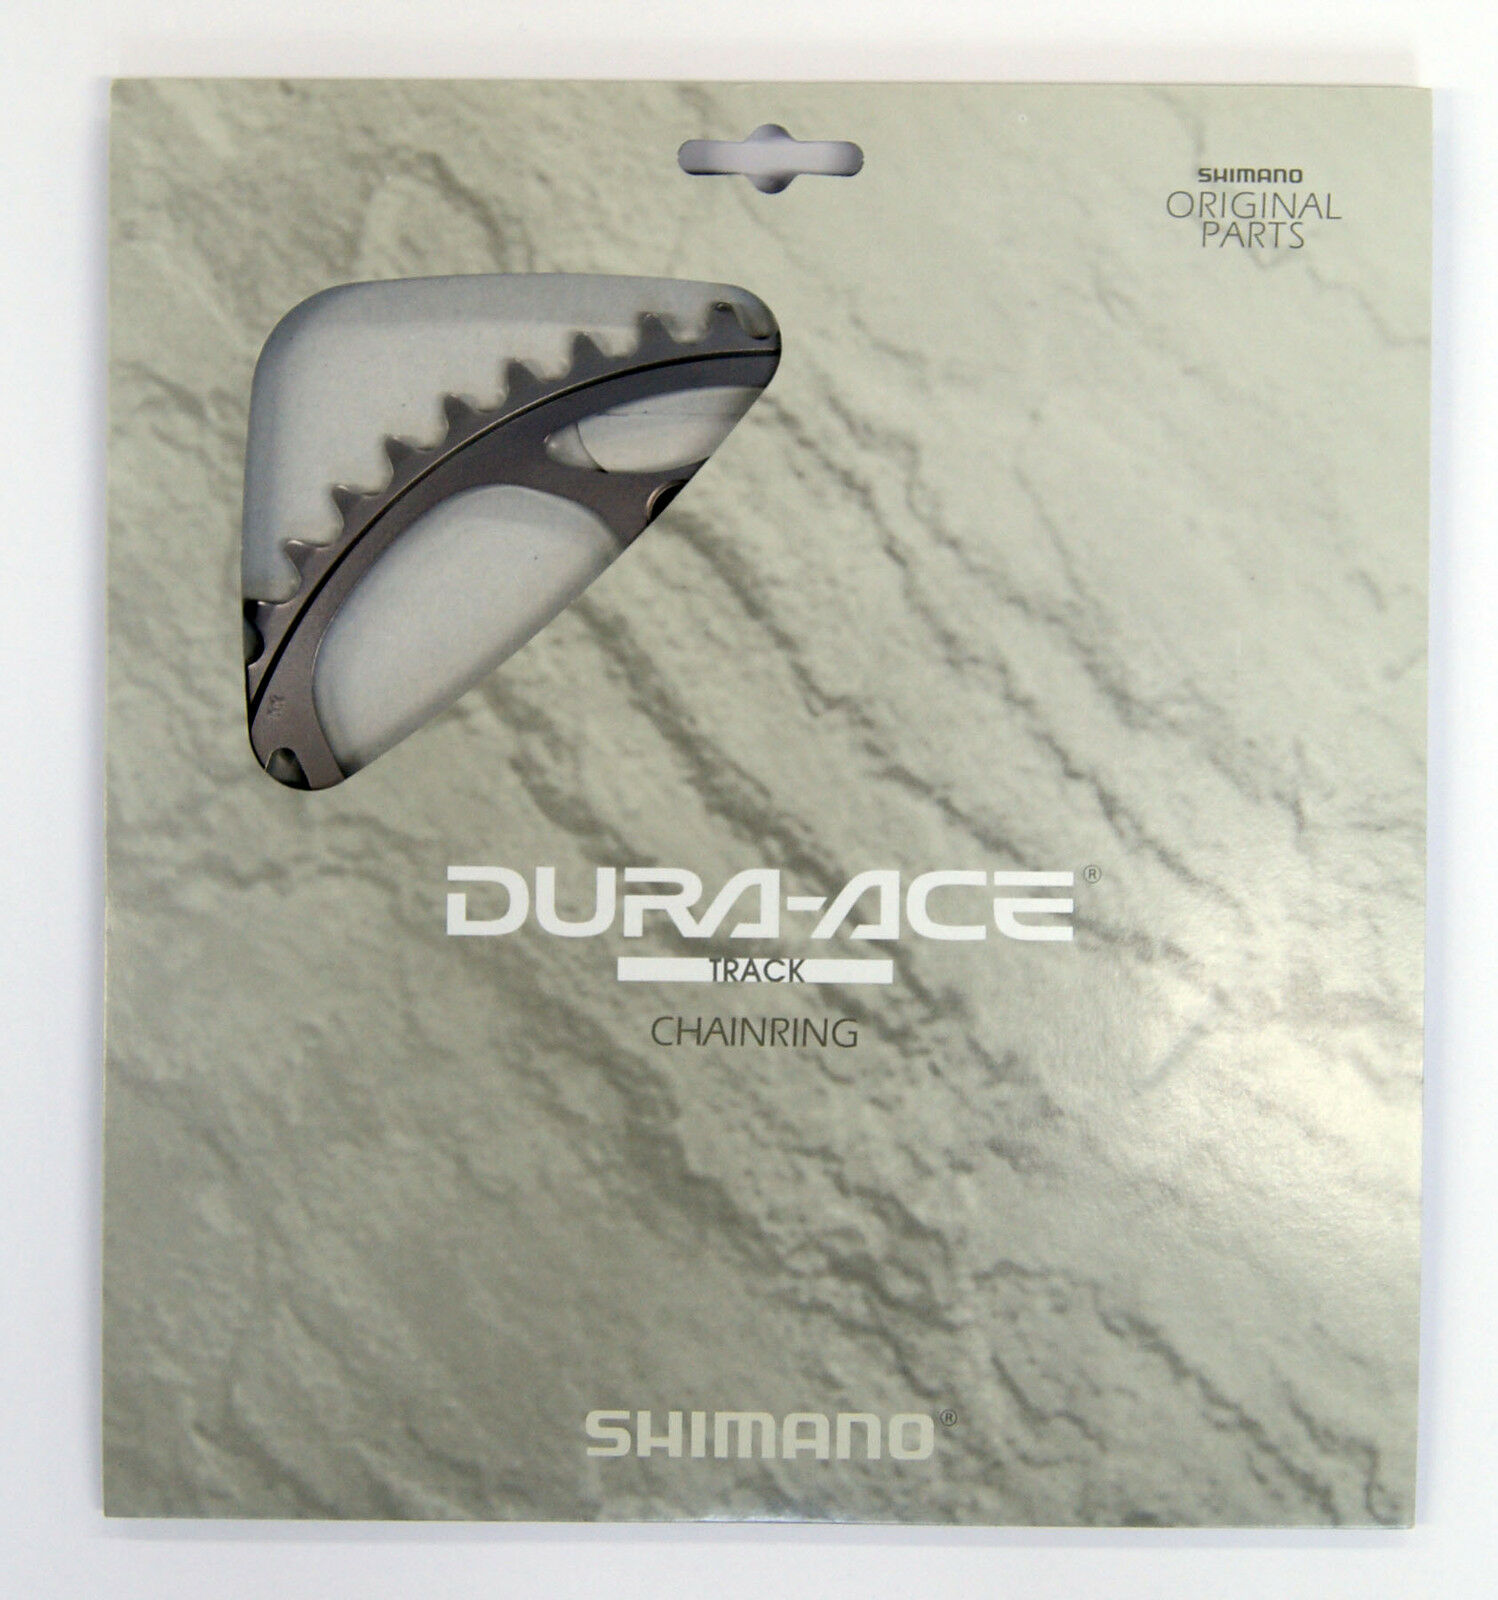 Shimano Dura-Ace Track FC-7710 52T 1 2   X 1 8   Kettenblatt ( Njs ) Y16s52001